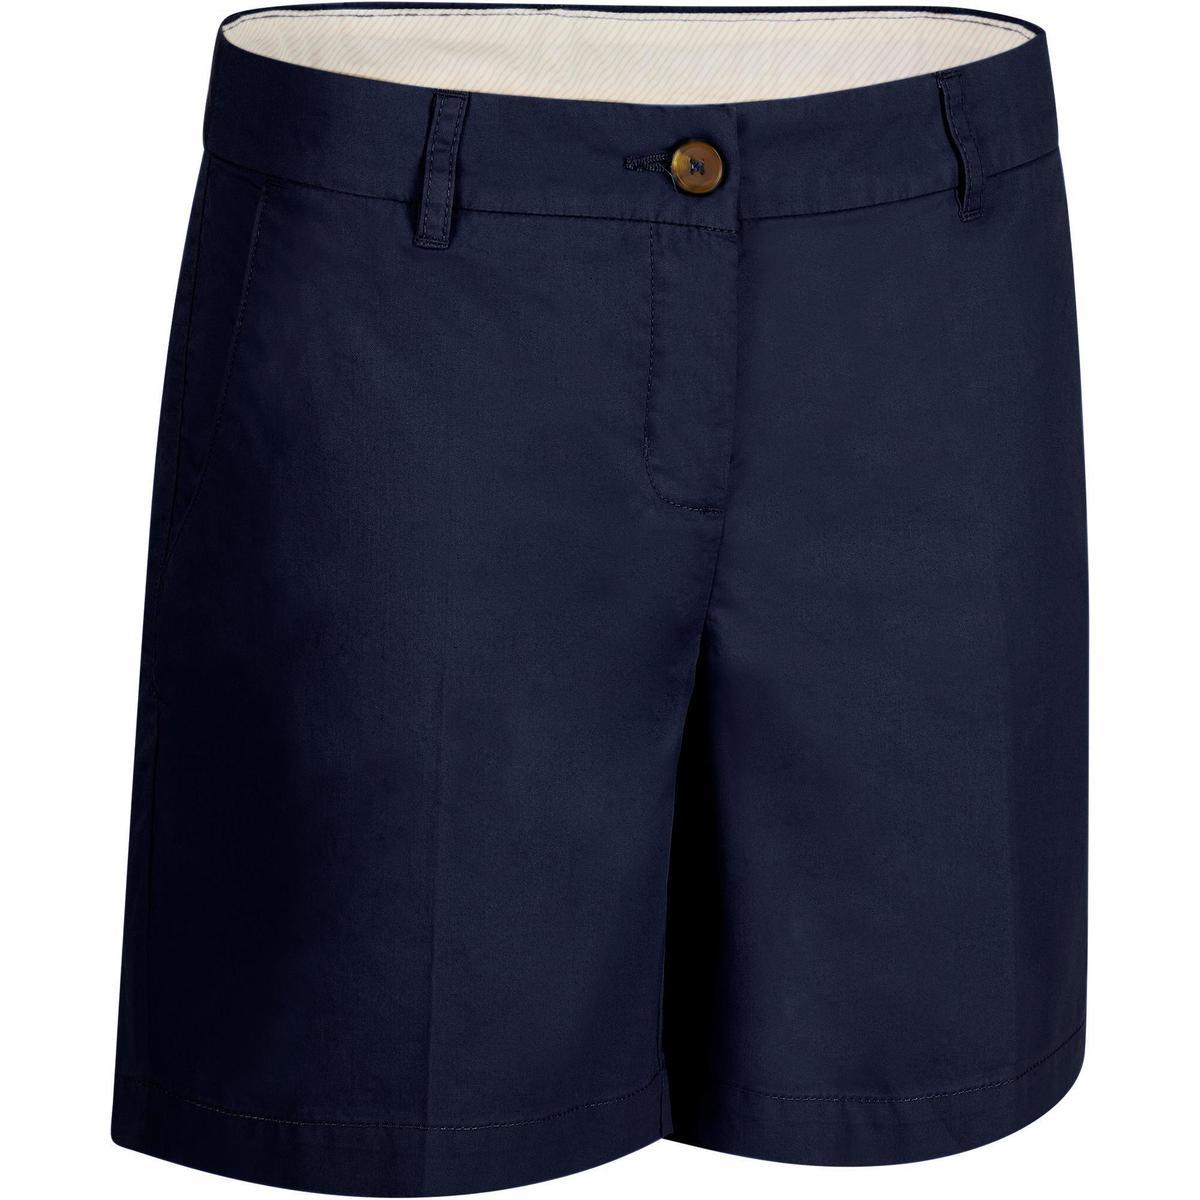 Bild 1 von Golf Bermuda Shorts 500 Damen marineblau